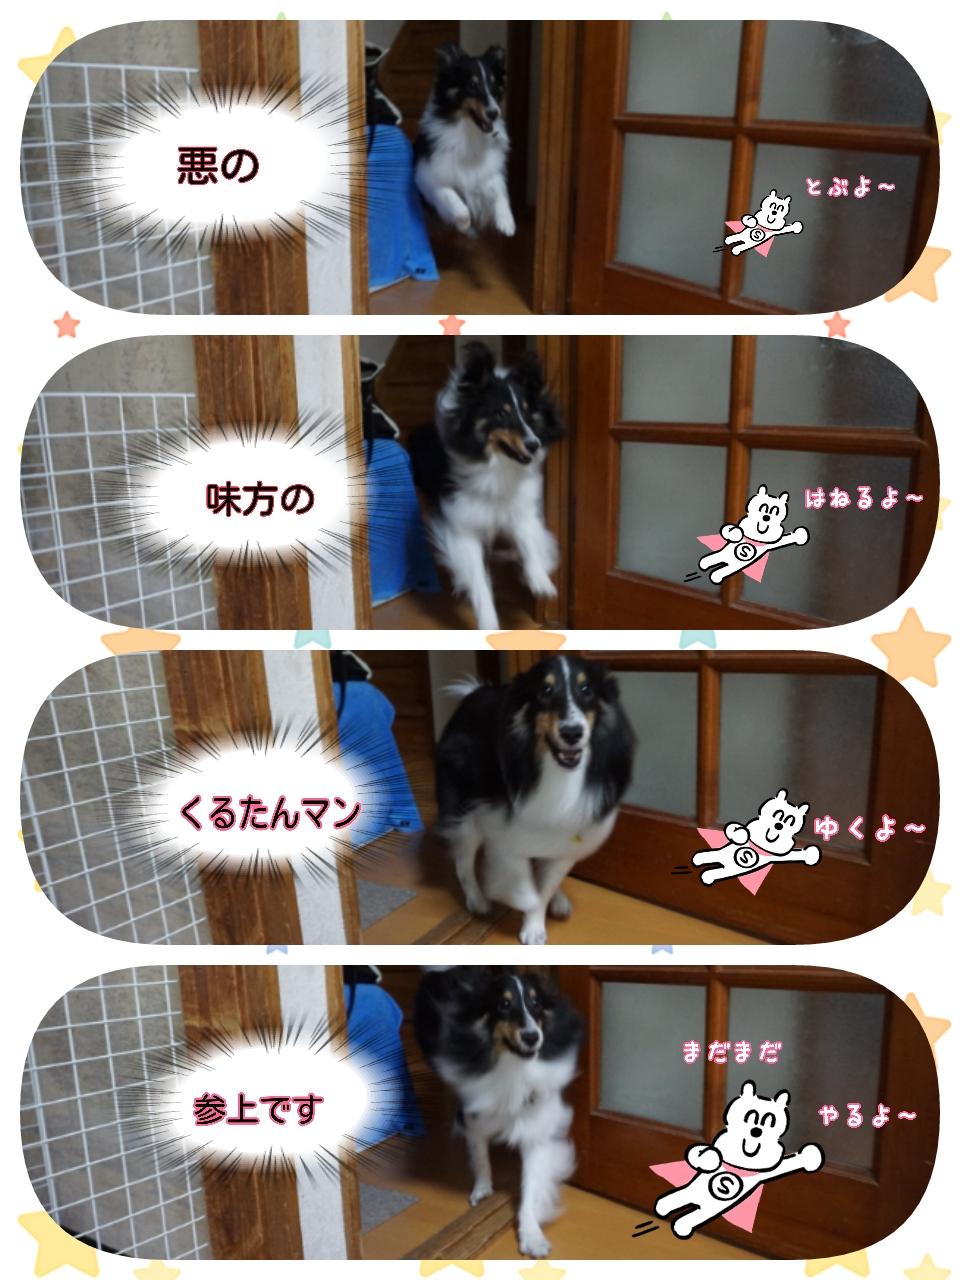 16-09-20-15-47-38-097_deco.jpg